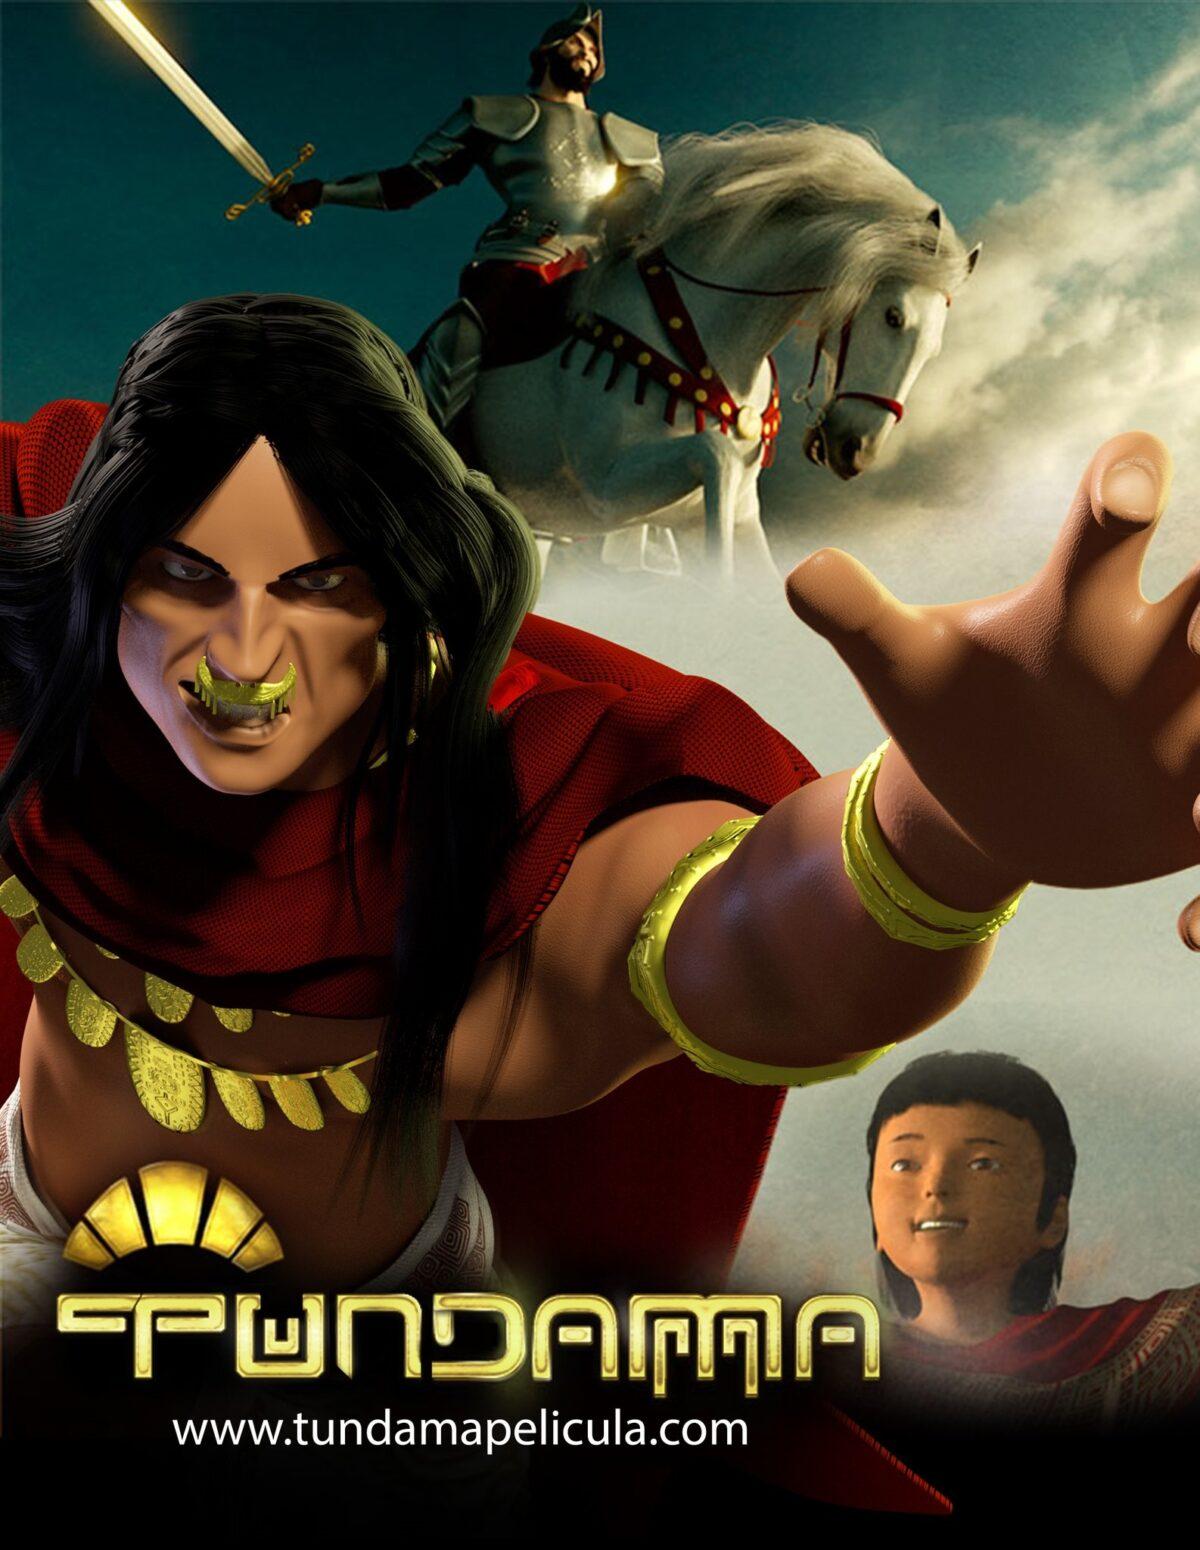 asi crearon tundama la primera pelicula animada sobre la lengua muisca tundama